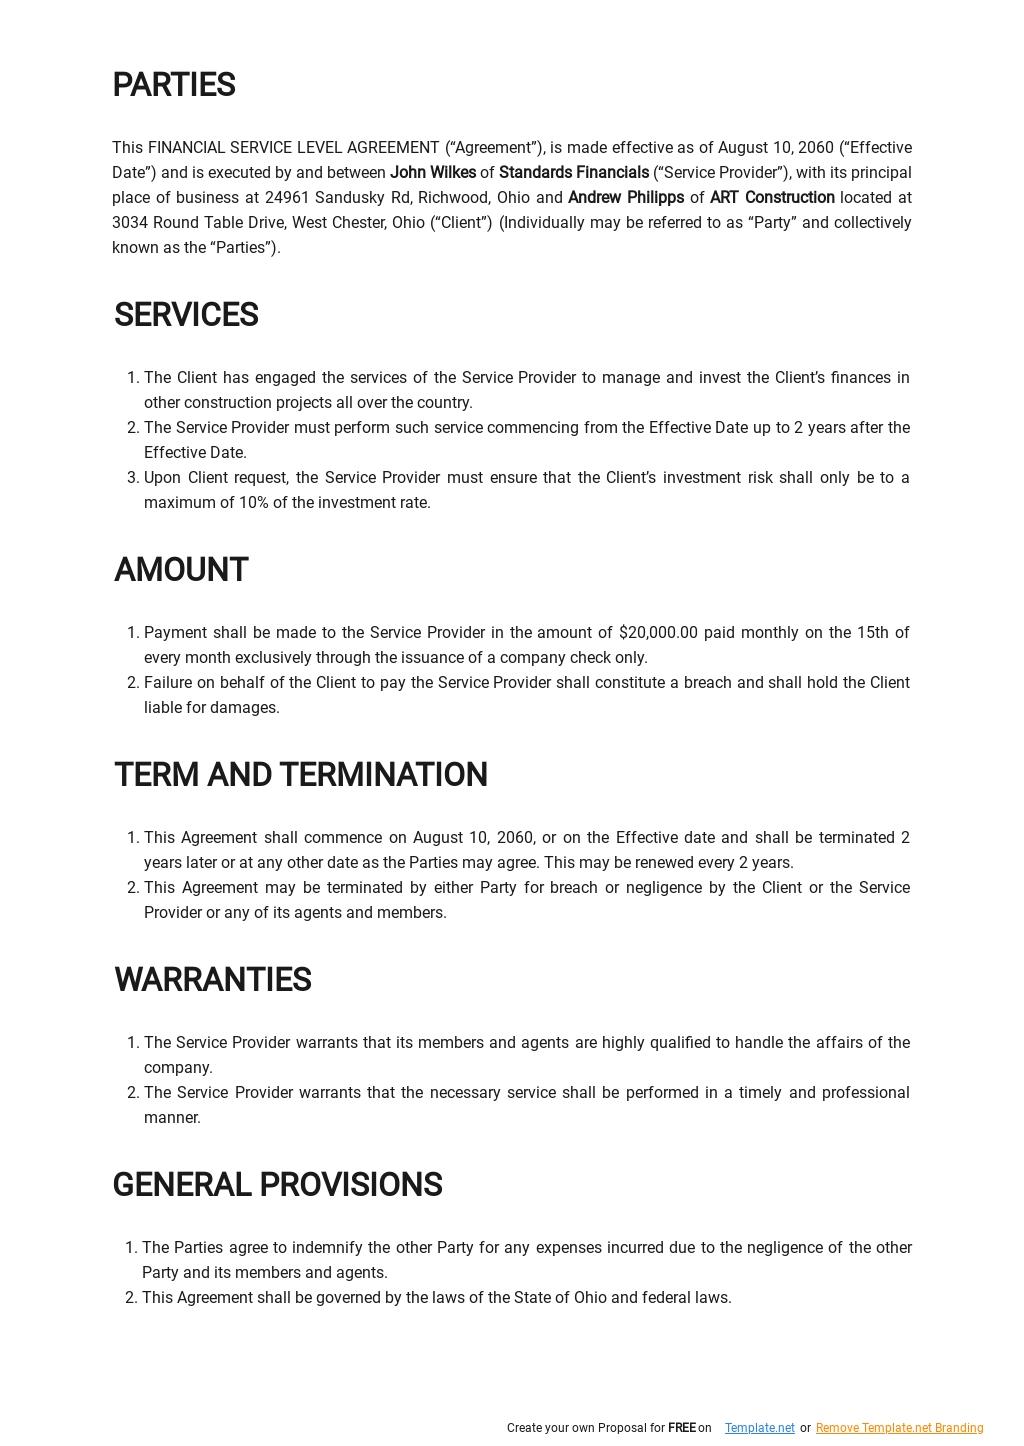 Financial Service Level Agreement Template  1.jpe